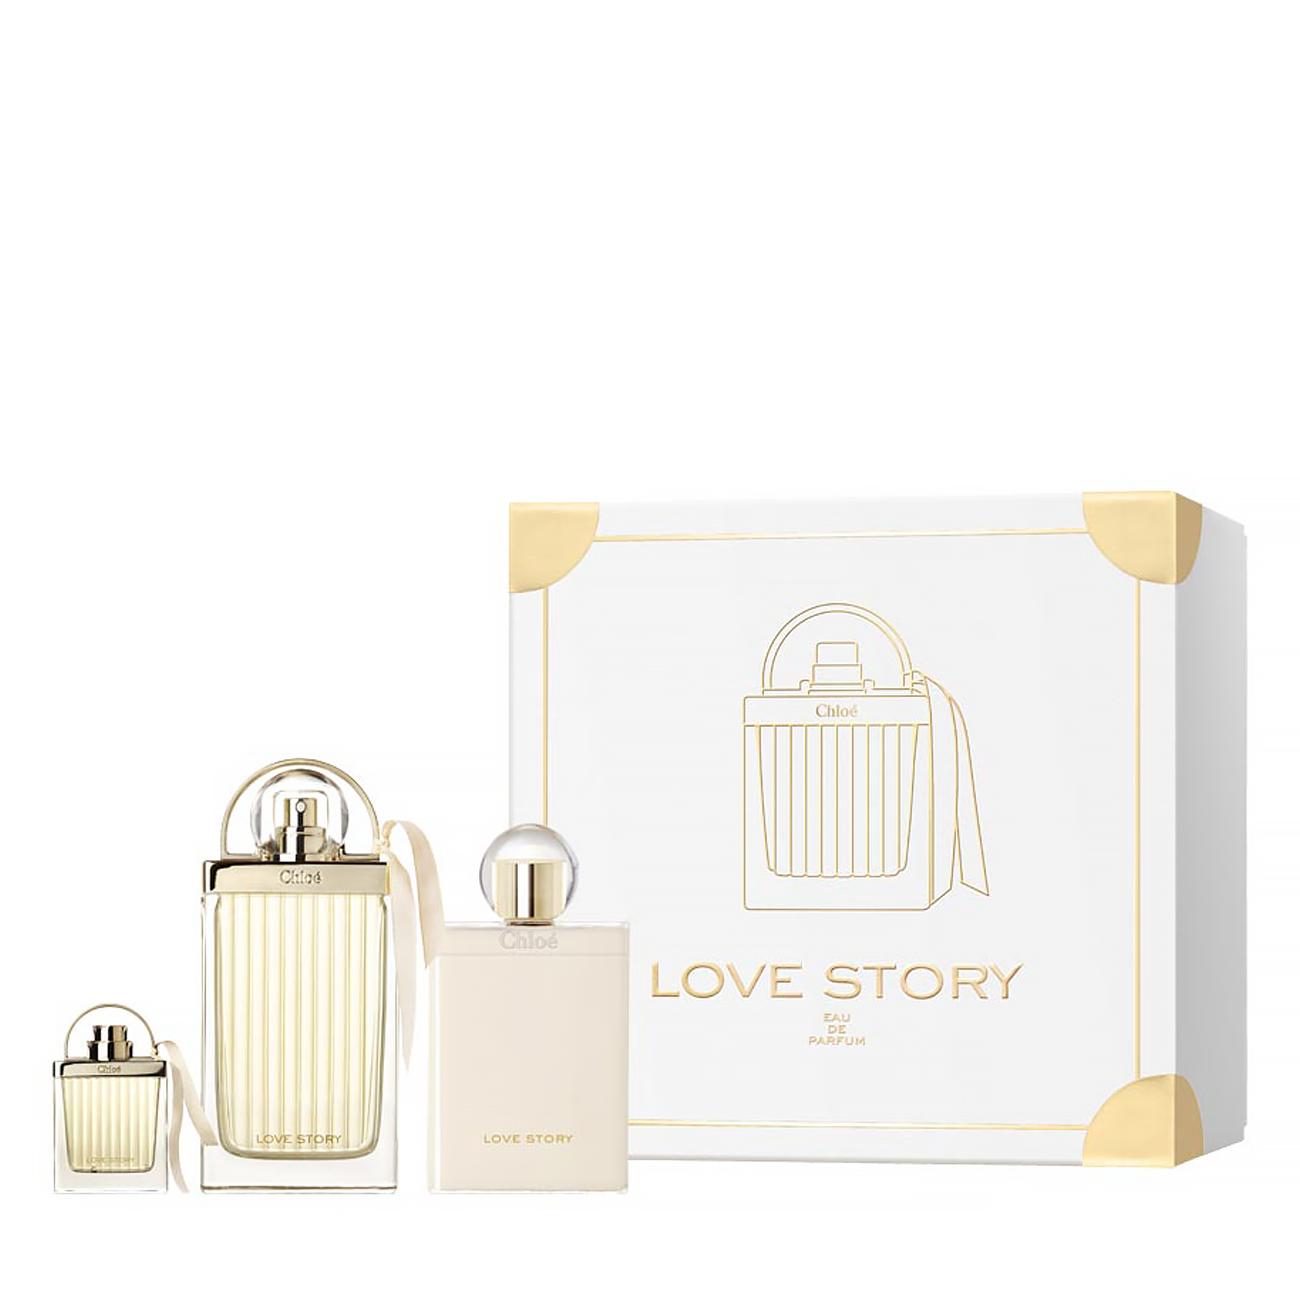 LOVE STORY SET 183ml imagine produs